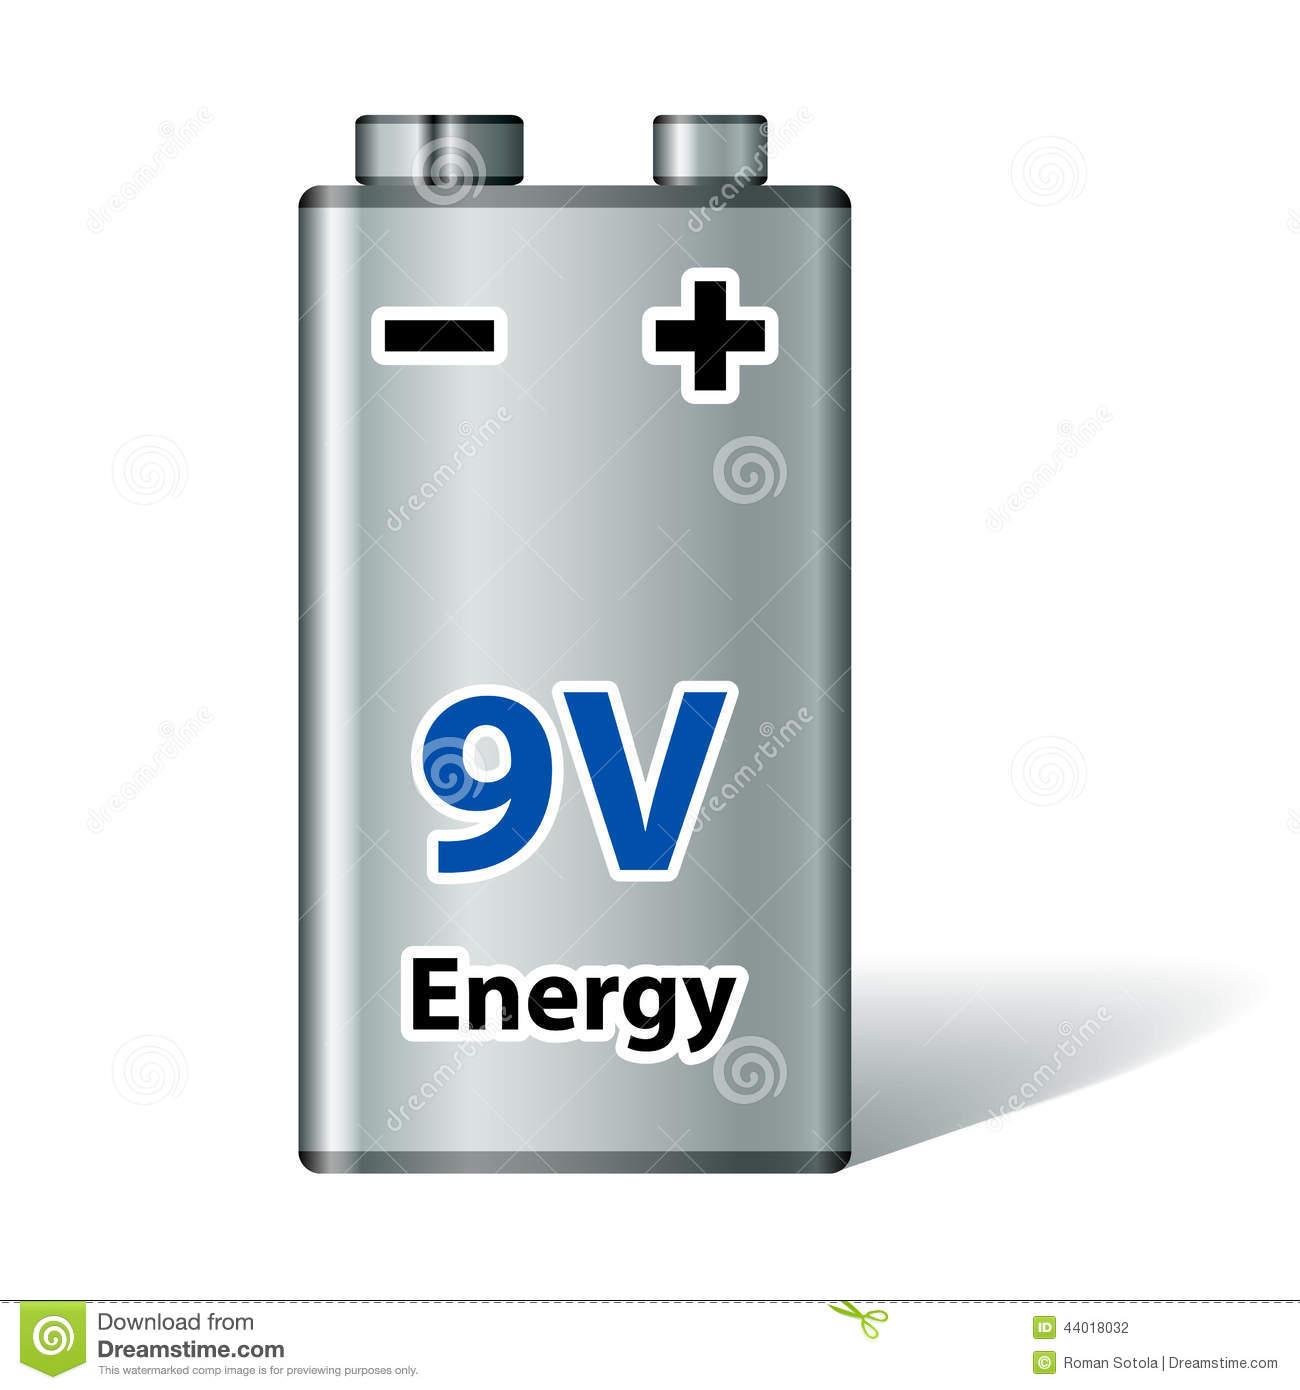 9 volt clipart clip library download Battery clipart 9 volt, Battery 9 volt Transparent FREE for download ... clip library download